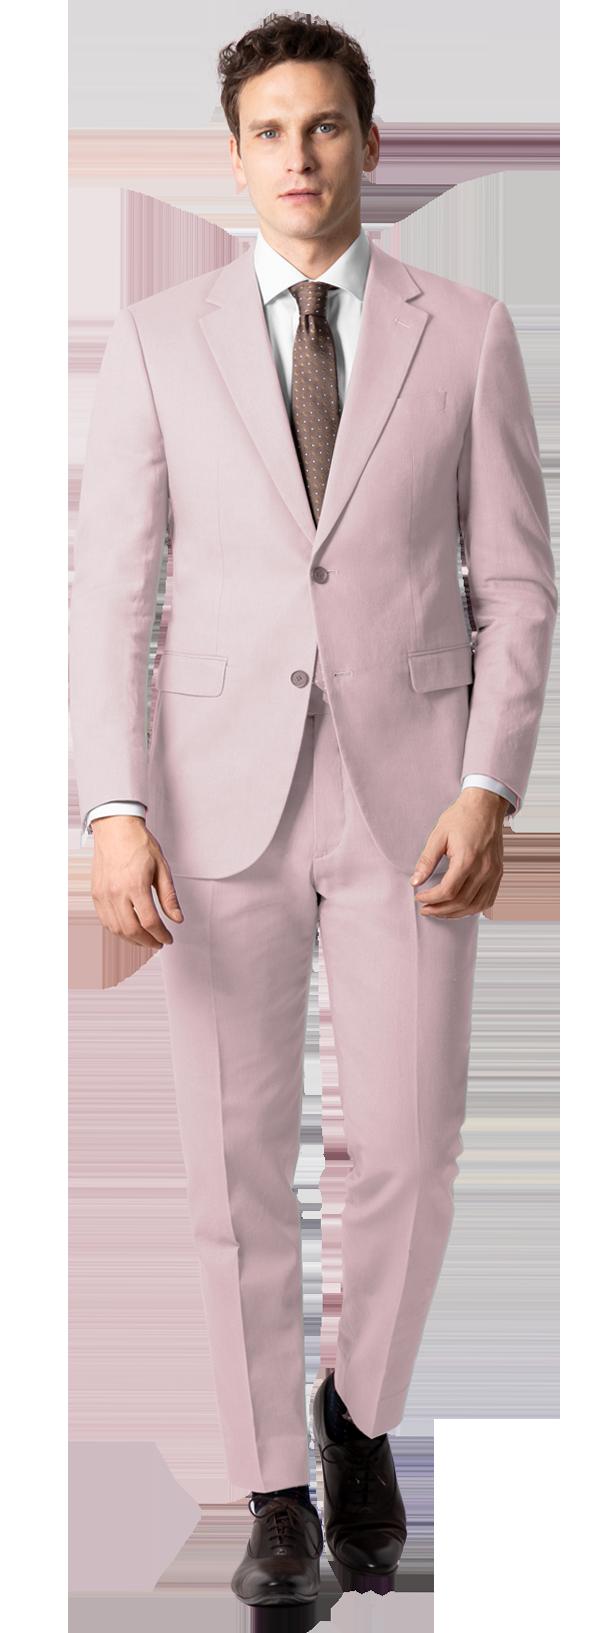 rosa anzug